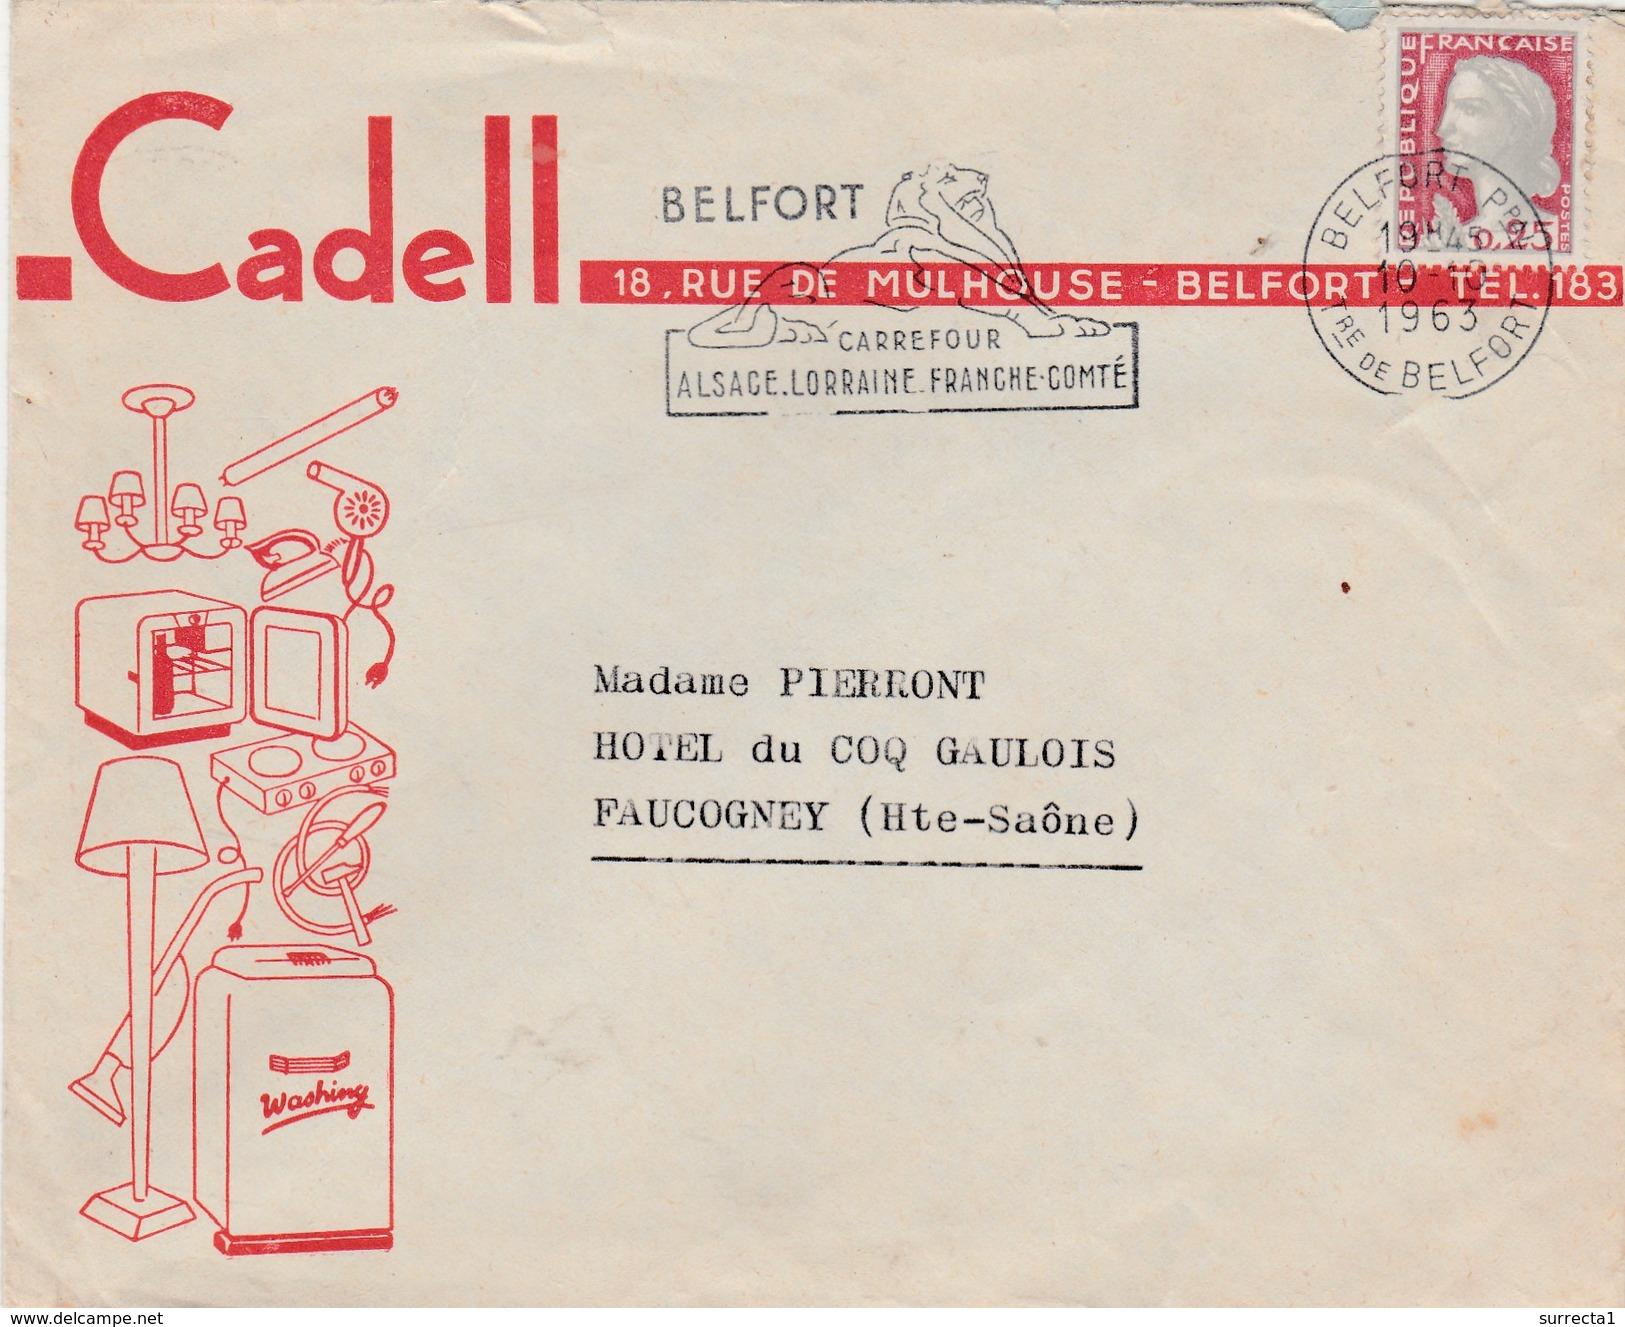 Enveloppe Commerciale /  CADELL / Electromenager Belfort / 90 / Flamme Du Lion De Belfort - Autres